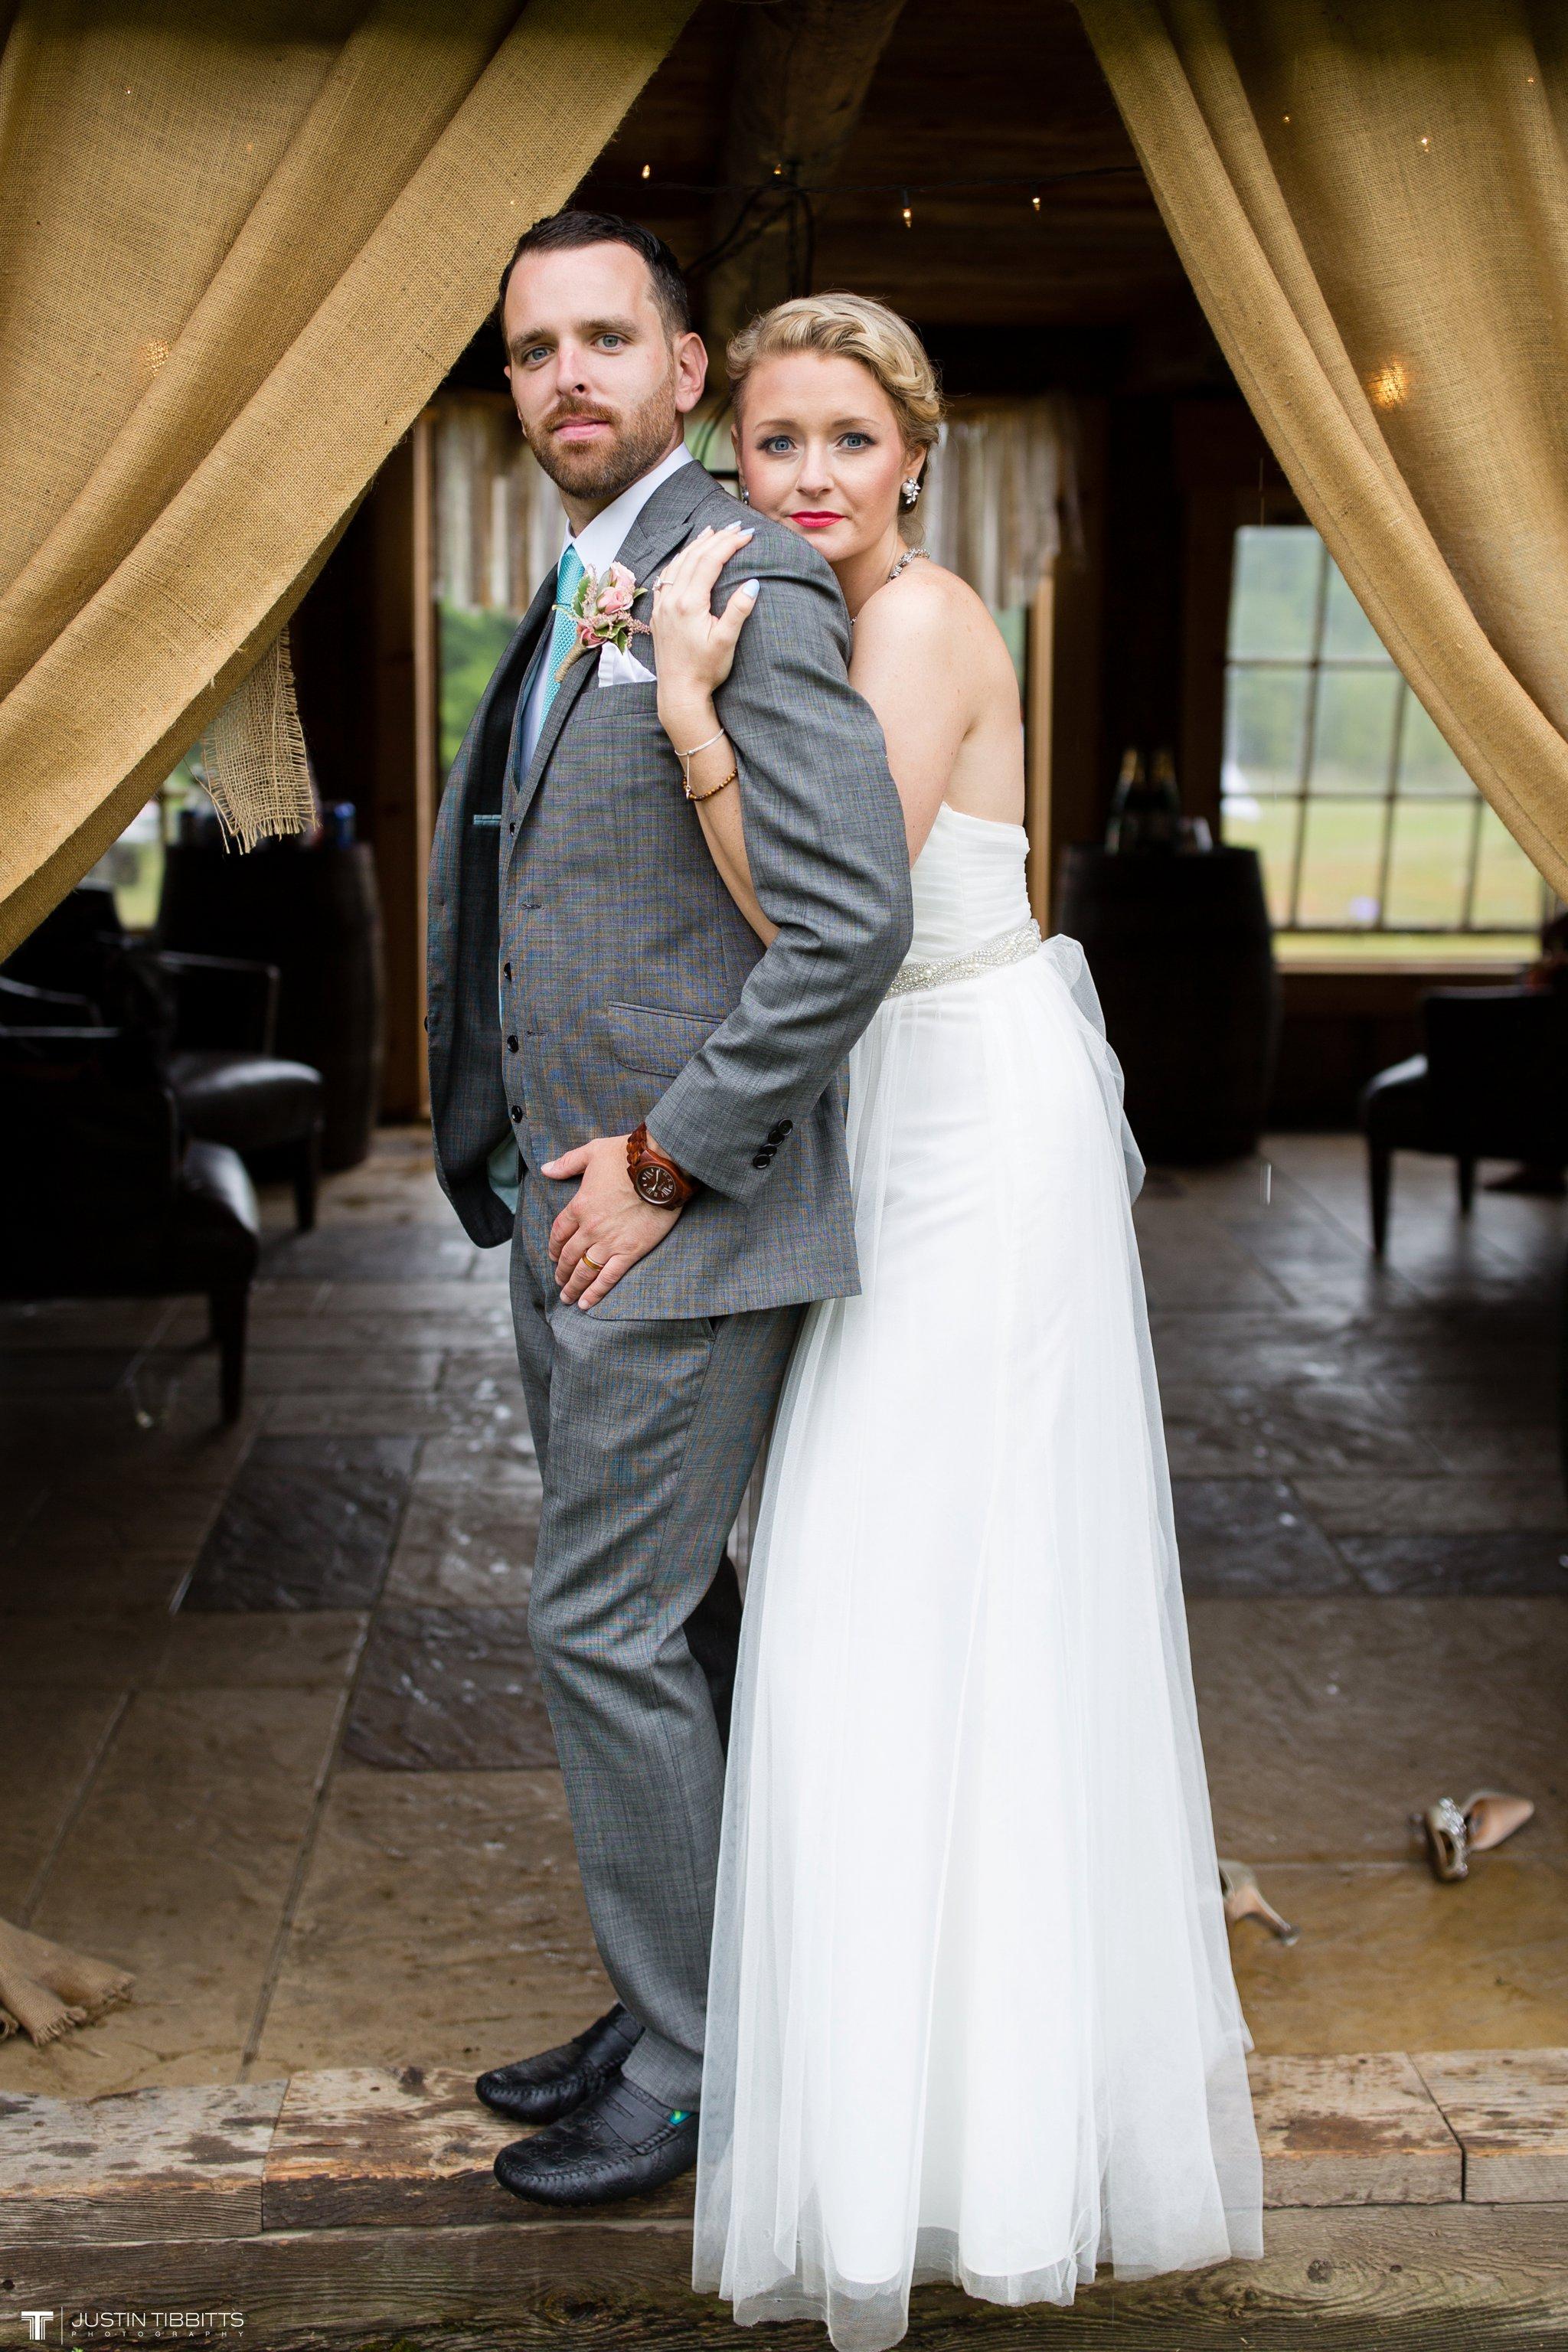 burlap-and-beams-wedding-photos-with-joran-and-molly_0084